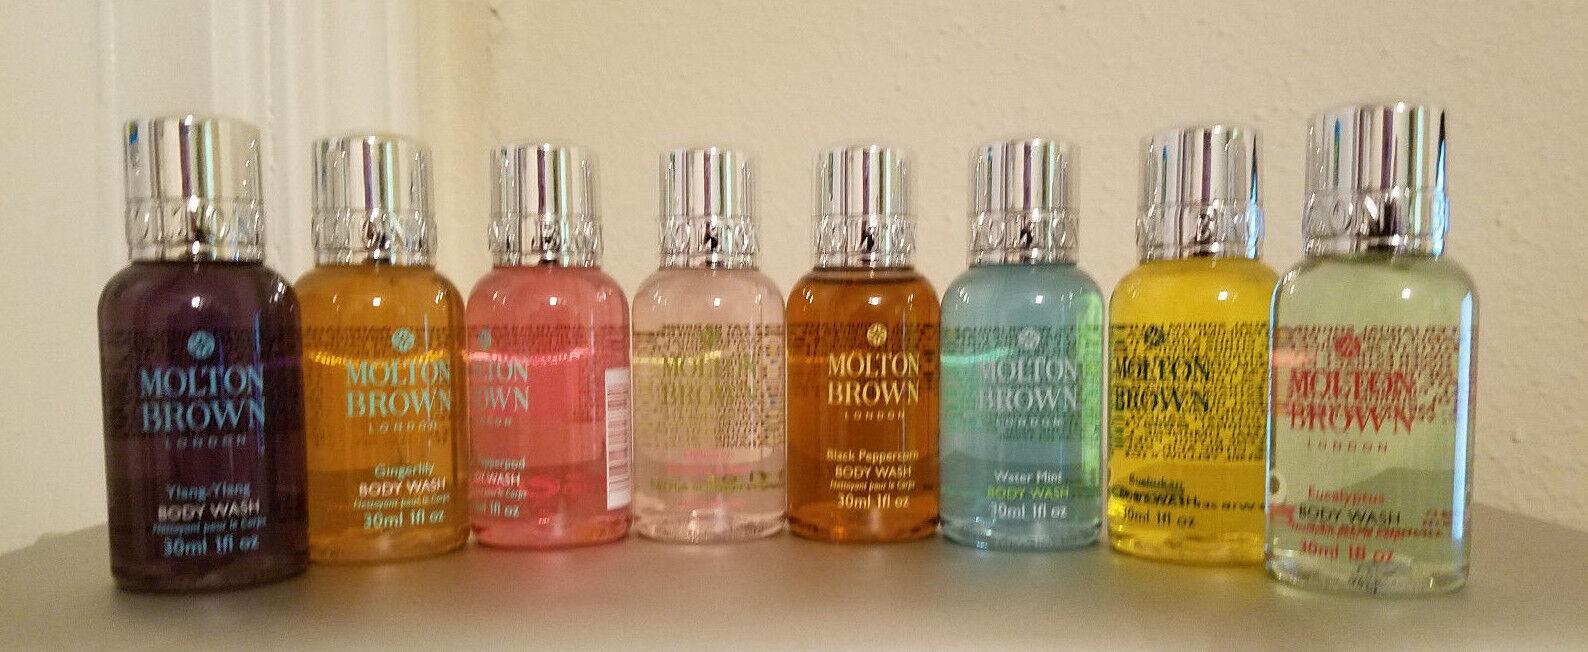 Molton Brown Body Wash Travel Size 30 ml/1 oz each